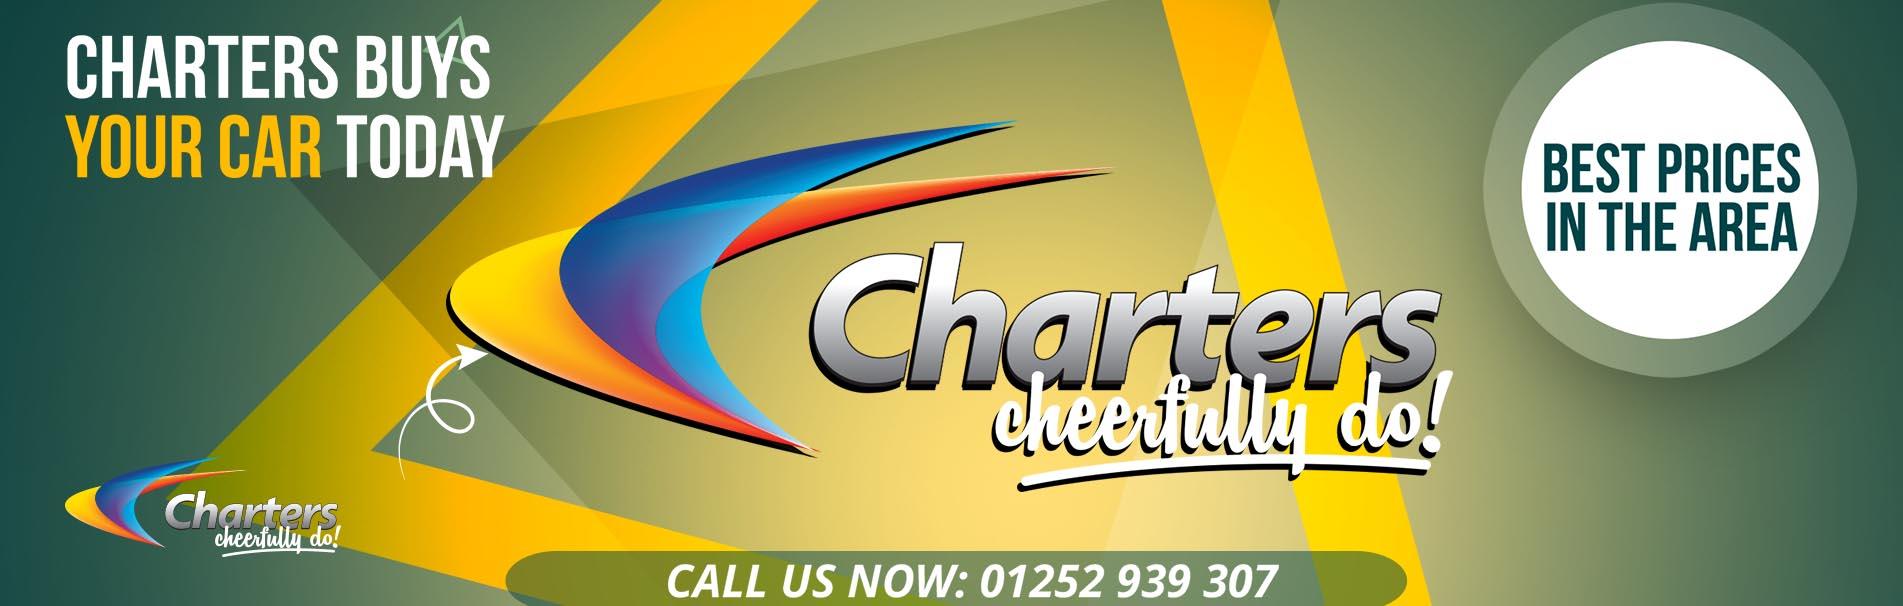 charters-peugeot-buys-your-car-p-sli